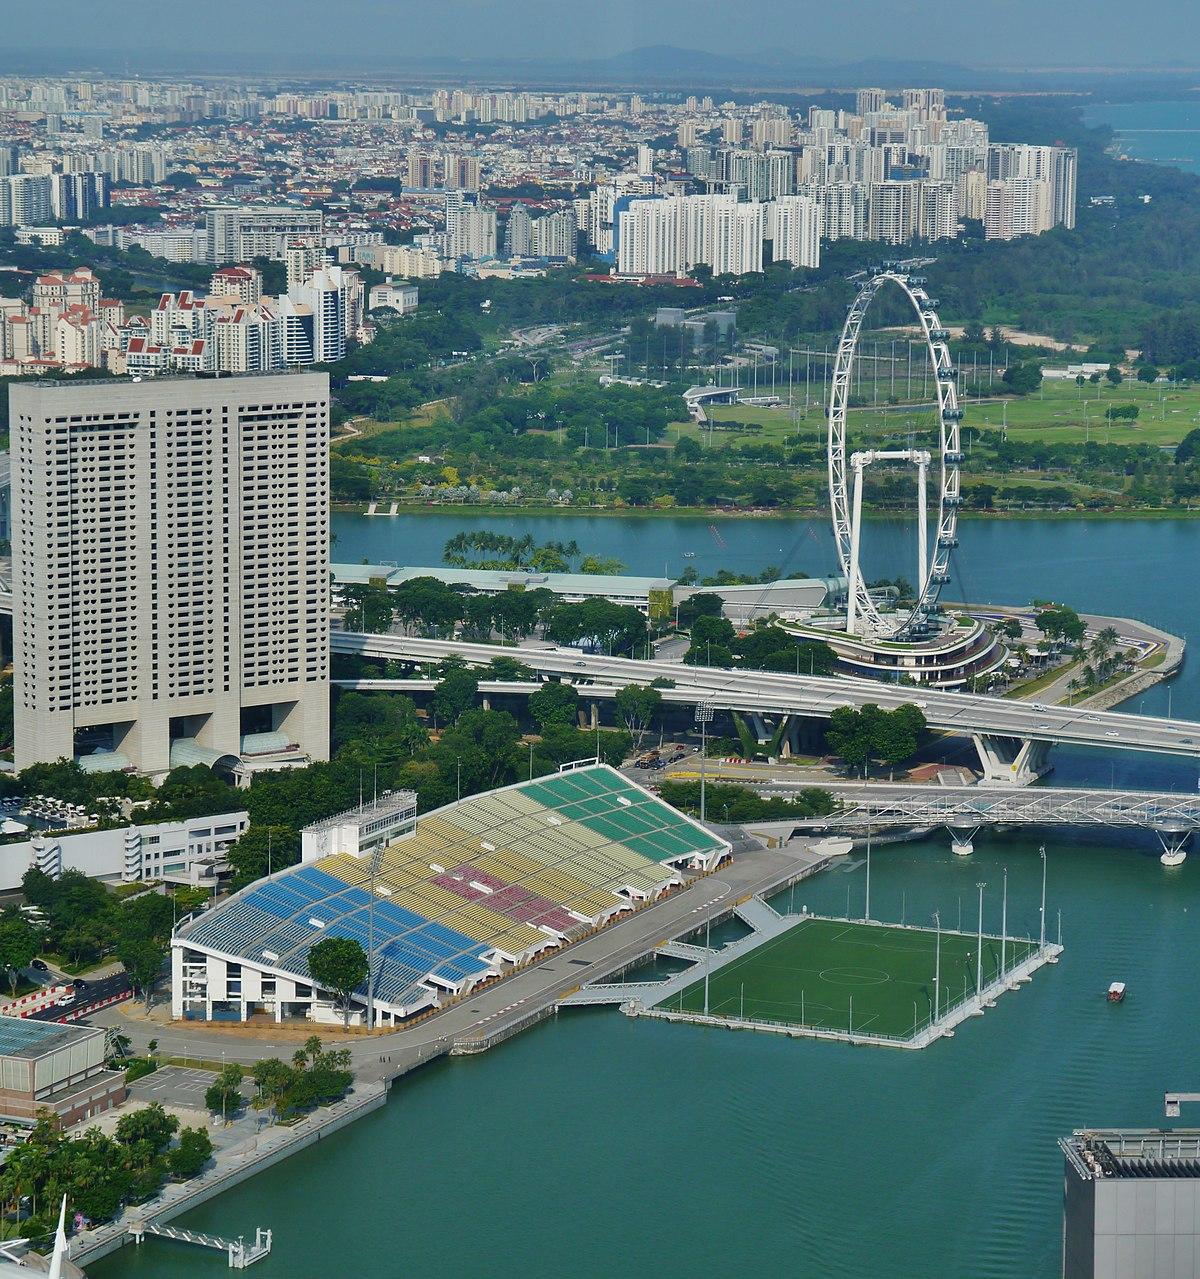 Singapore Singapore Flyer & The Float @ Marina Bay viewed from UOB Plaza.jpg